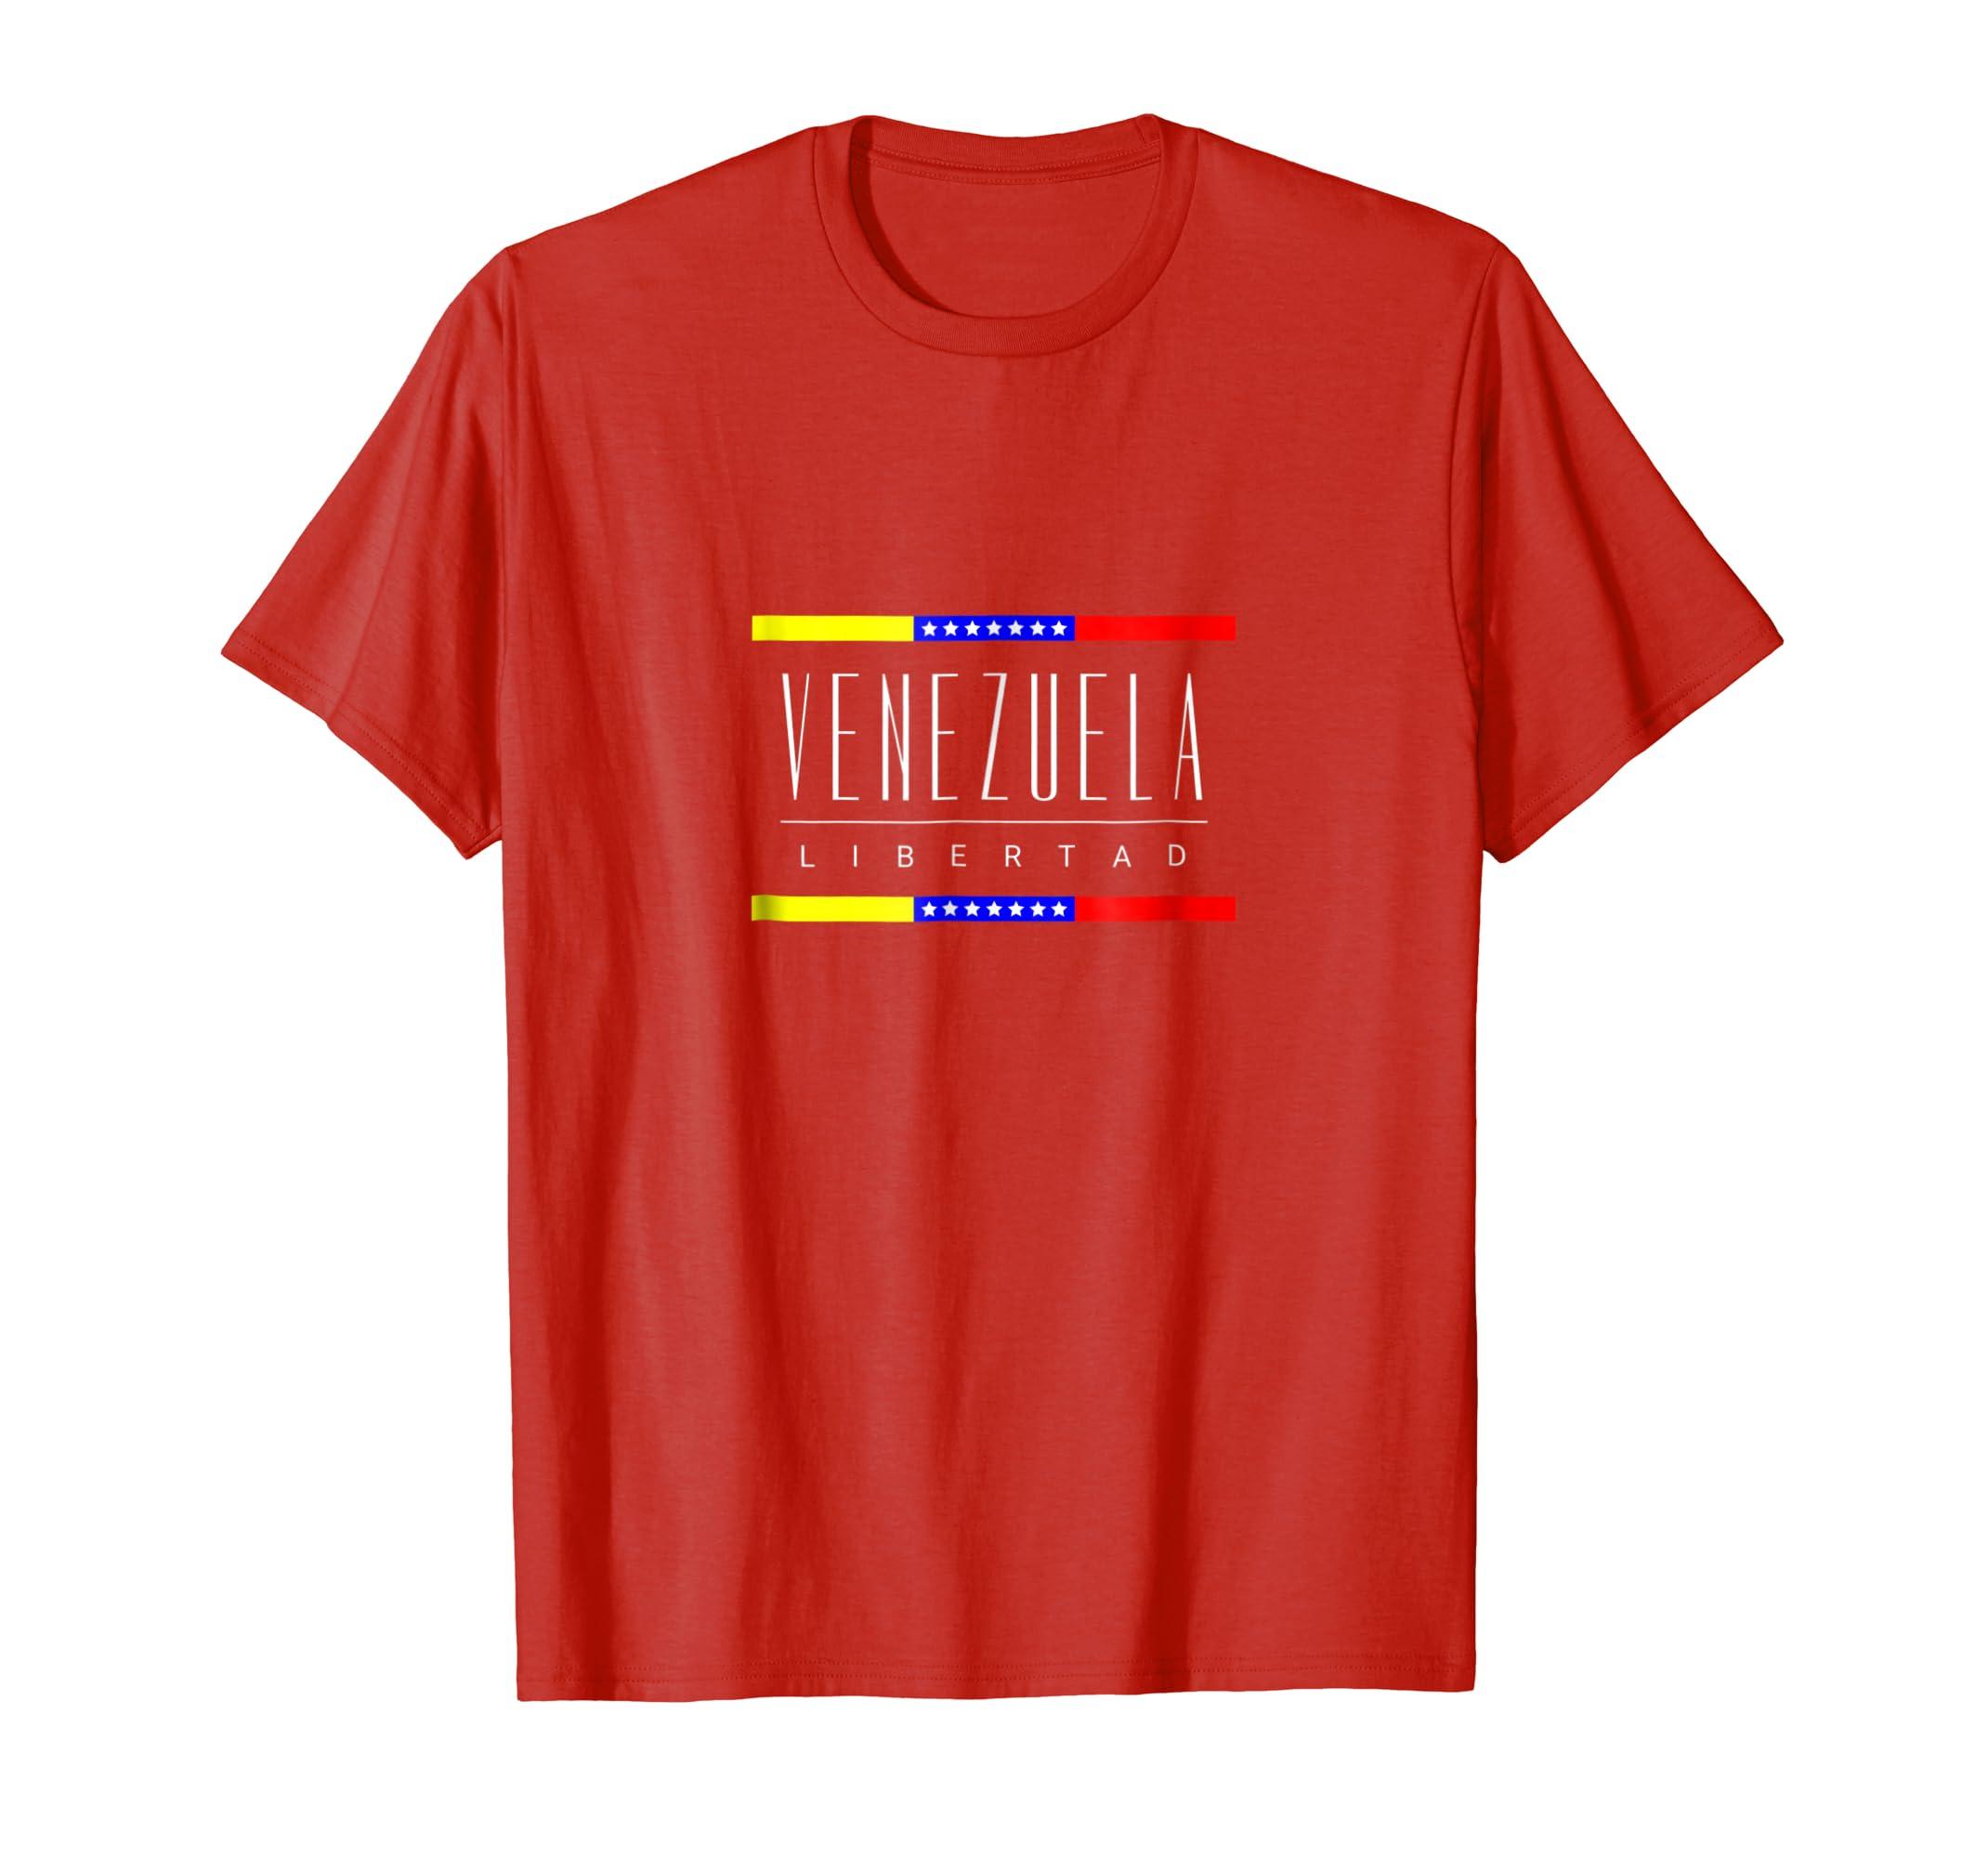 Amazon.com: Venezuela Shirt Libertad Tee Tricolor Star flag Venezuela: Clothing